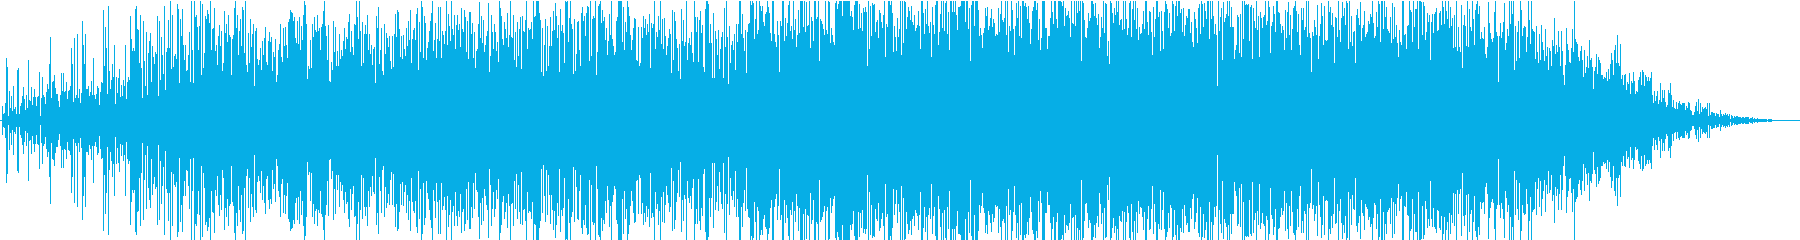 BooDooの再生済みの波形